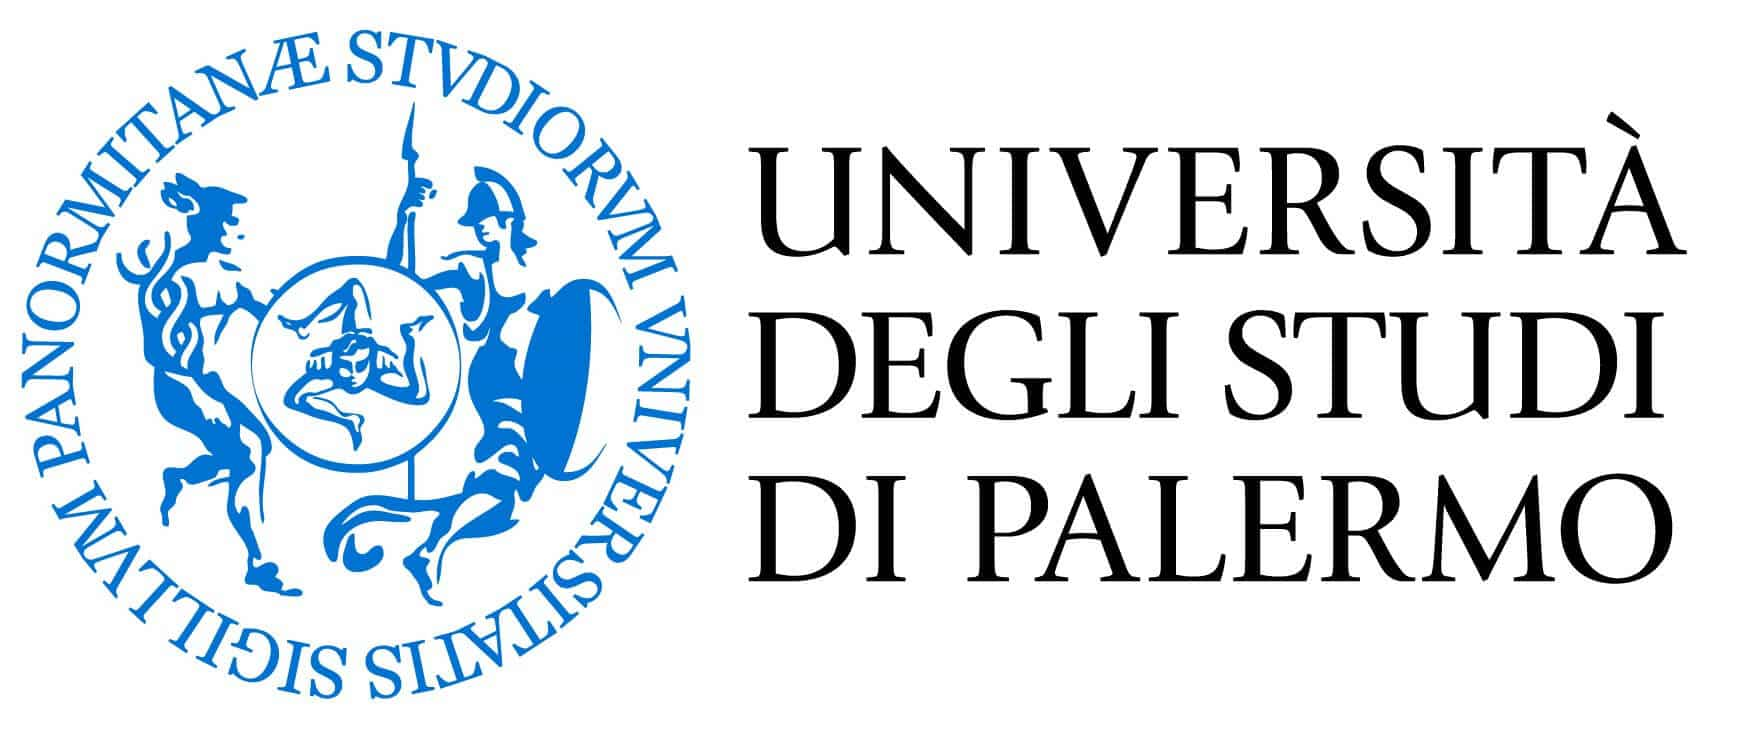 Resultado de imagen para universitá degli studi di palermo